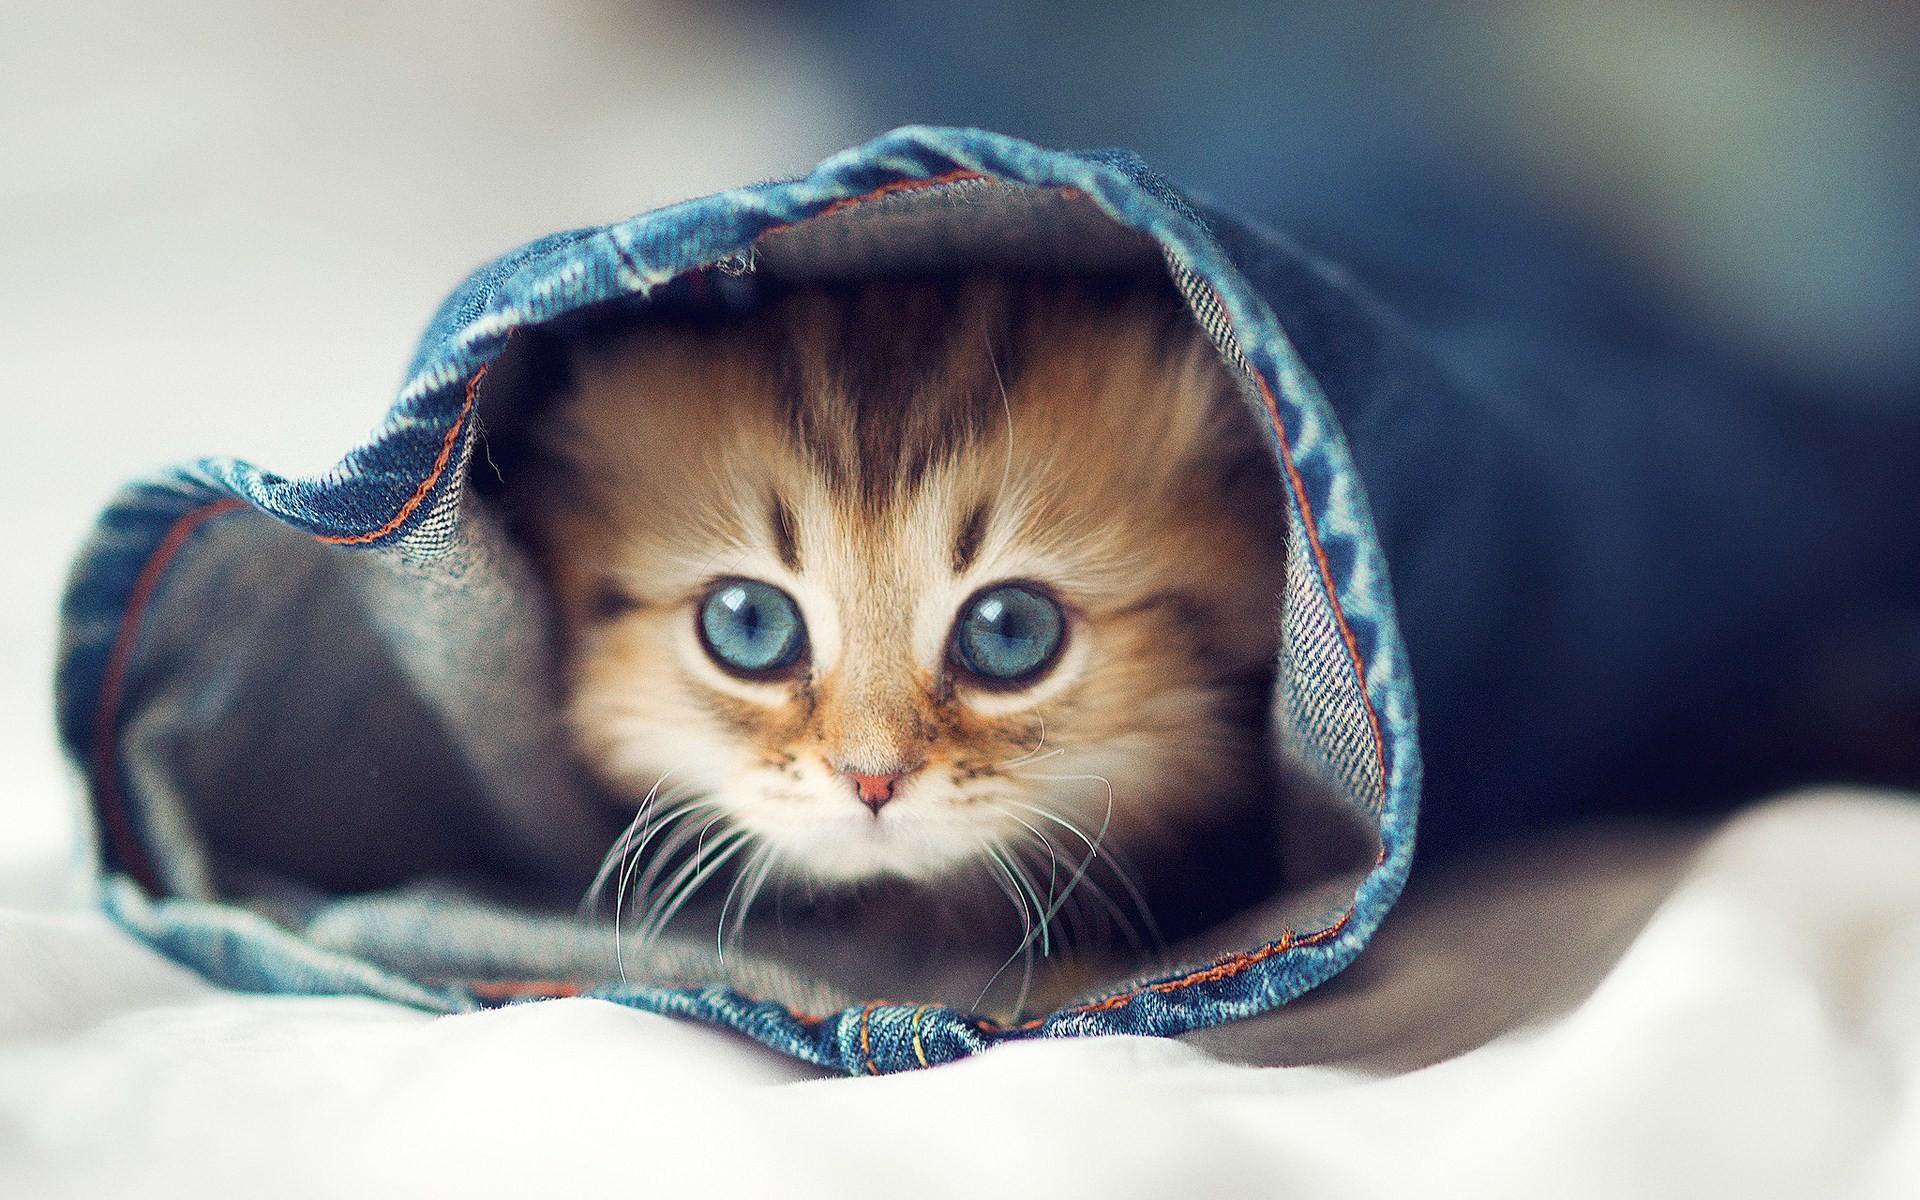 Top HDQ Cute Cat Images